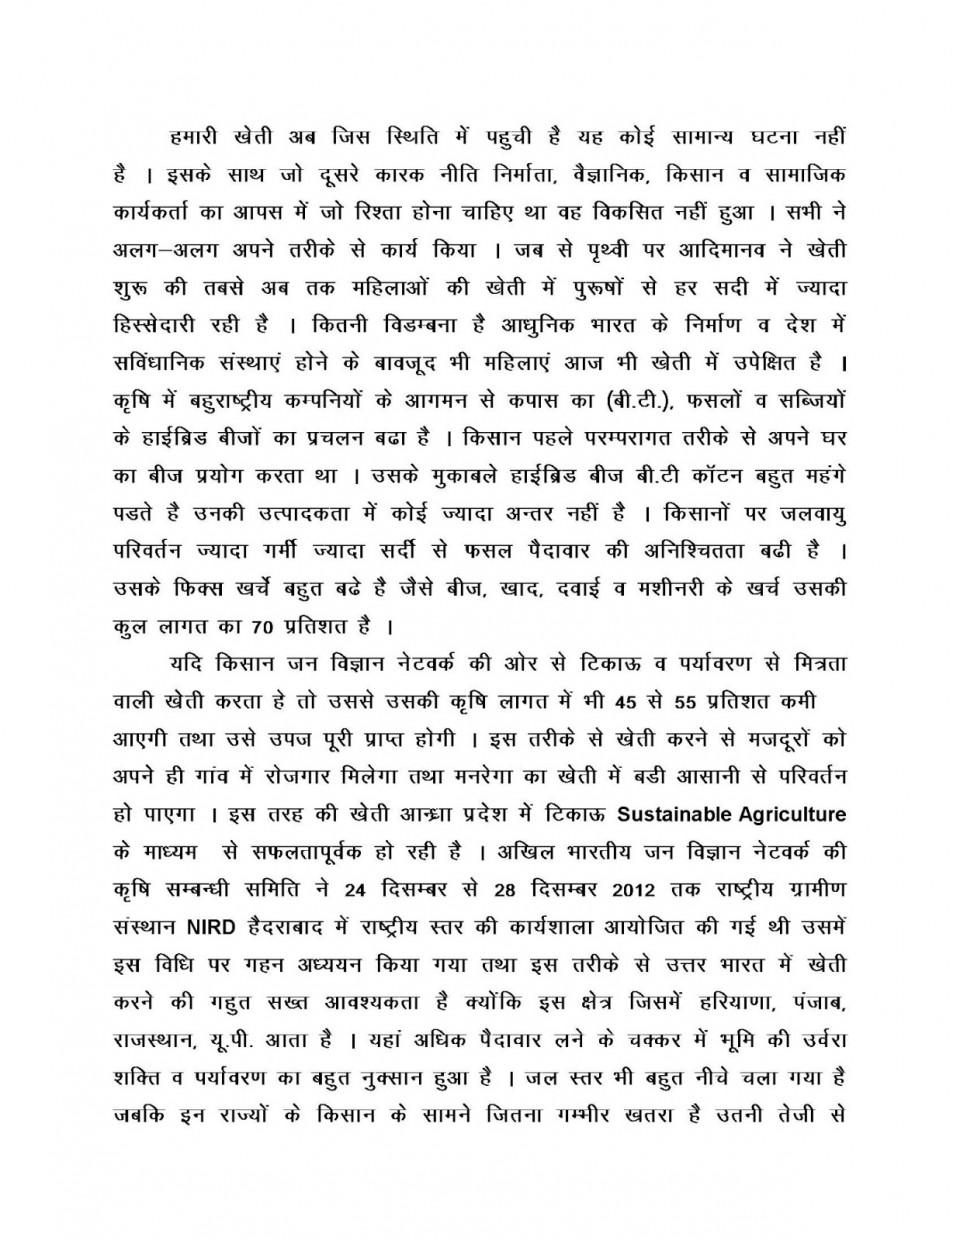 008 Essay Example Hindiworkdr Rajindersingh Page 3 Formidable Equality Questions Gender Titles 960